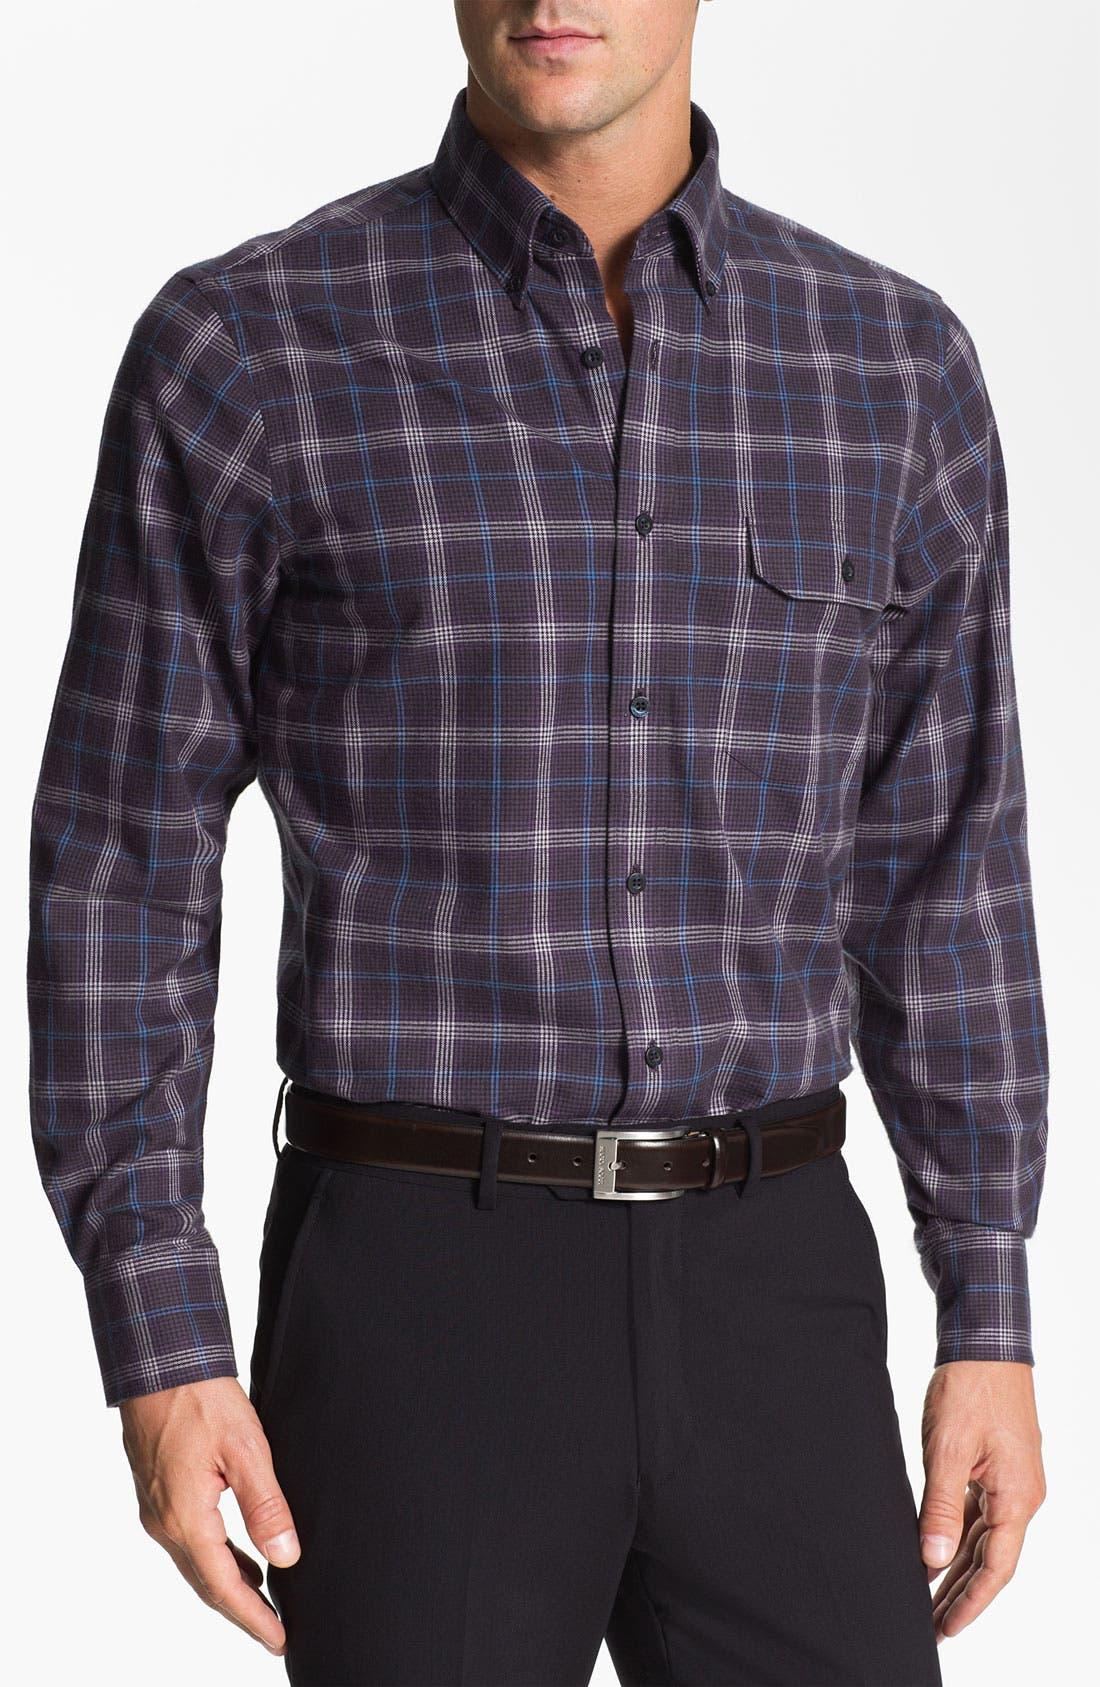 Main Image - Nordstrom Regular Fit Cotton Flannel Shirt